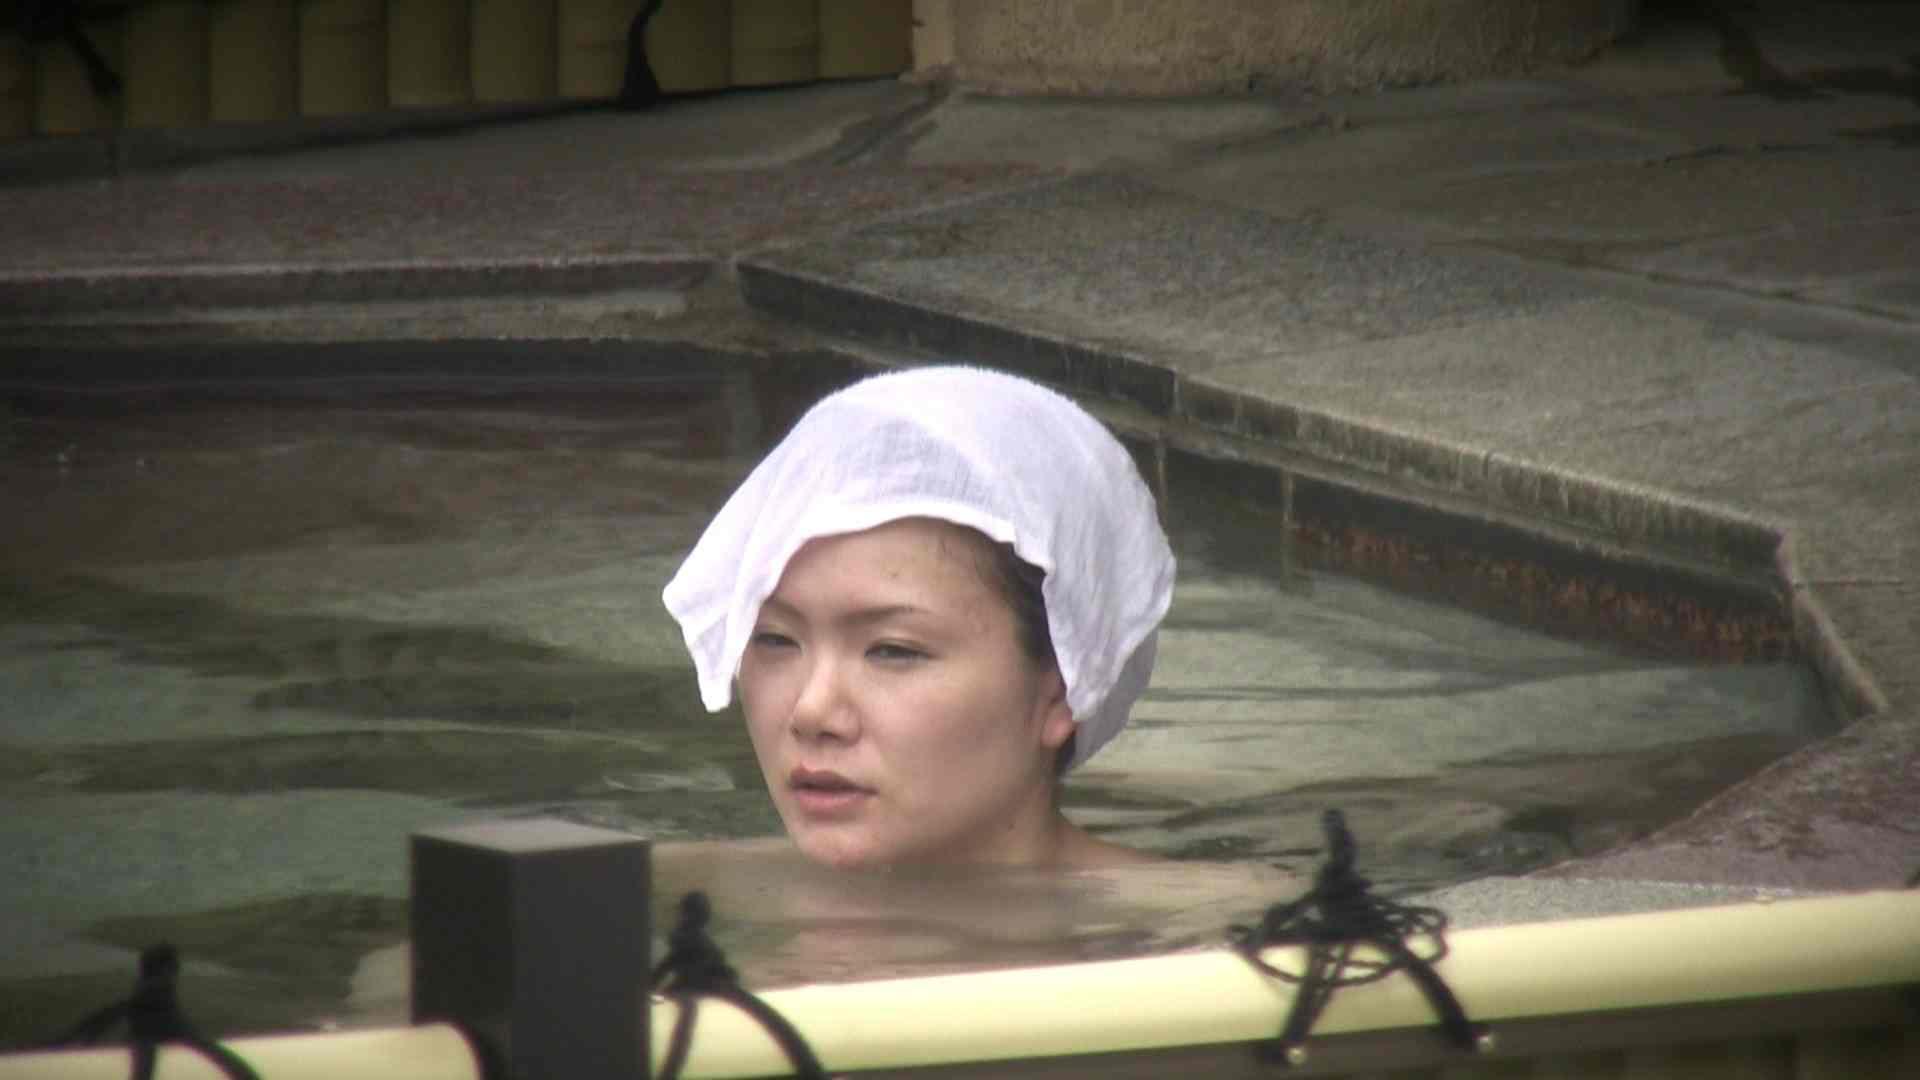 Aquaな露天風呂Vol.12【VIP】 HなOL | 盗撮  83pic 5